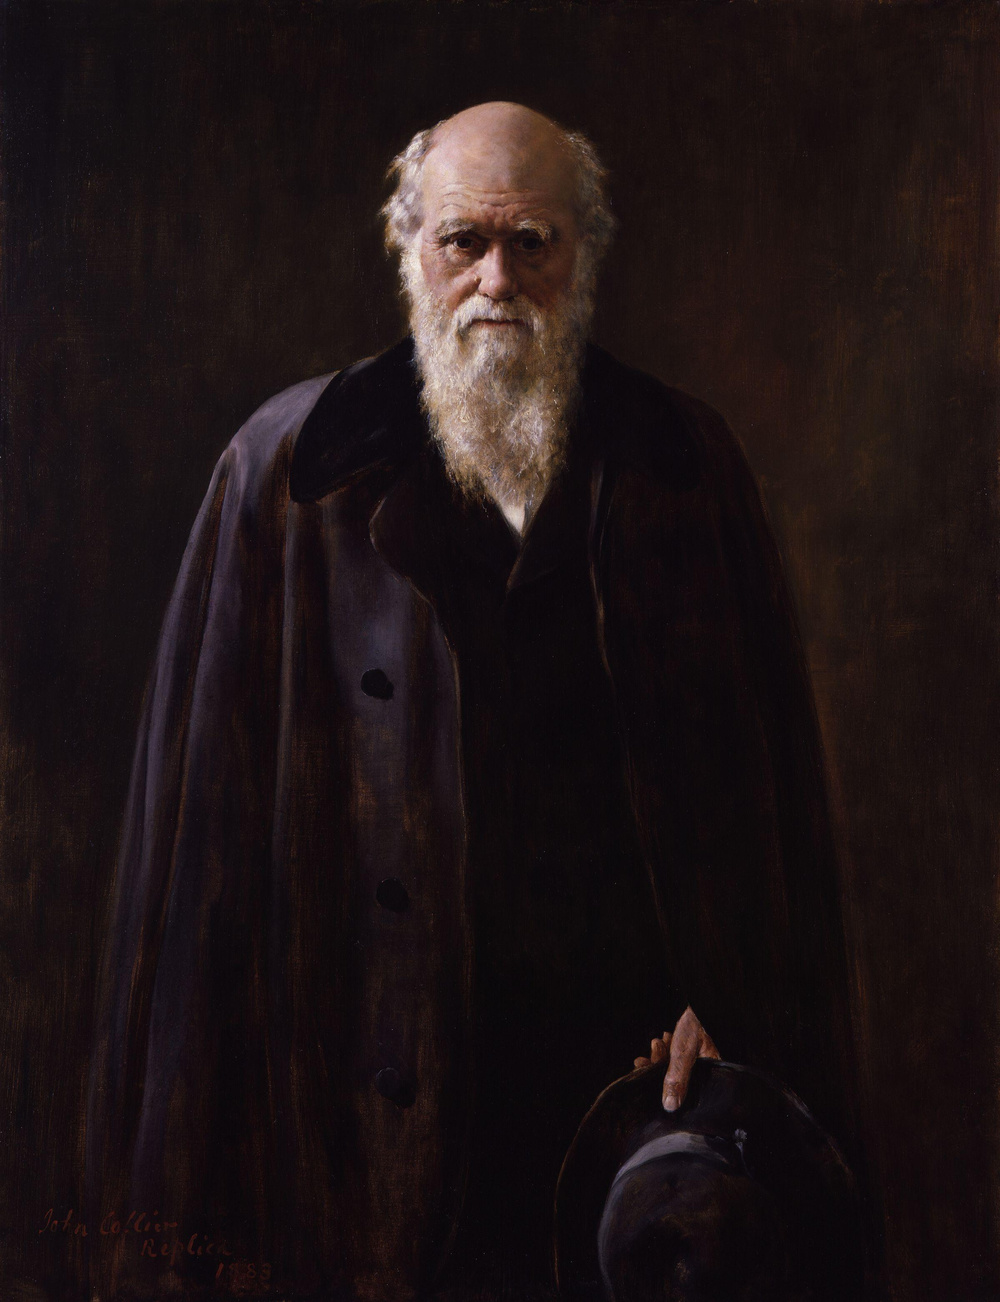 Charles_Robert_Darwin_by_John_Collier.jpg